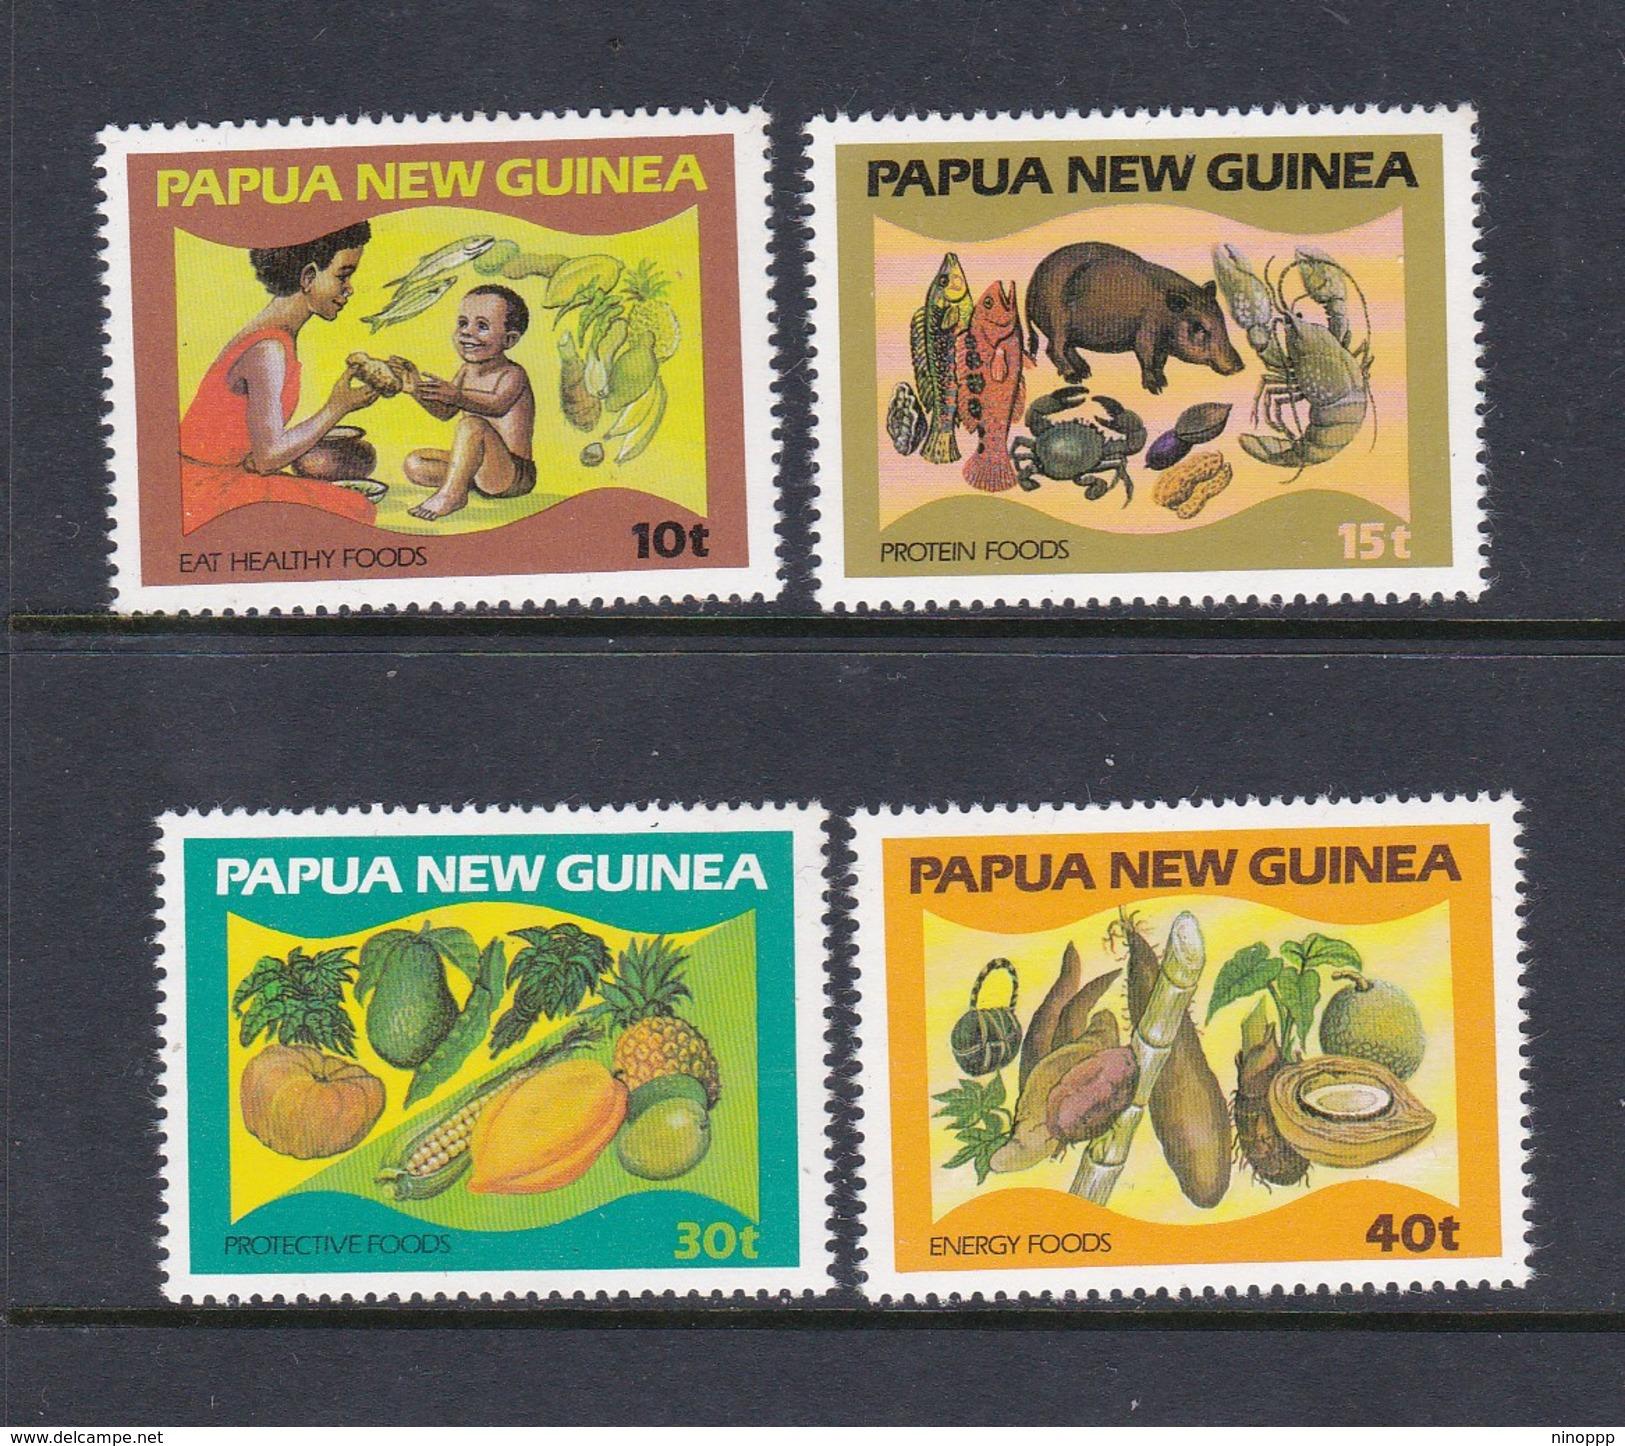 Papua New Guinea SG 434-437 1982 Food And Nutrition  MNH - Papua New Guinea